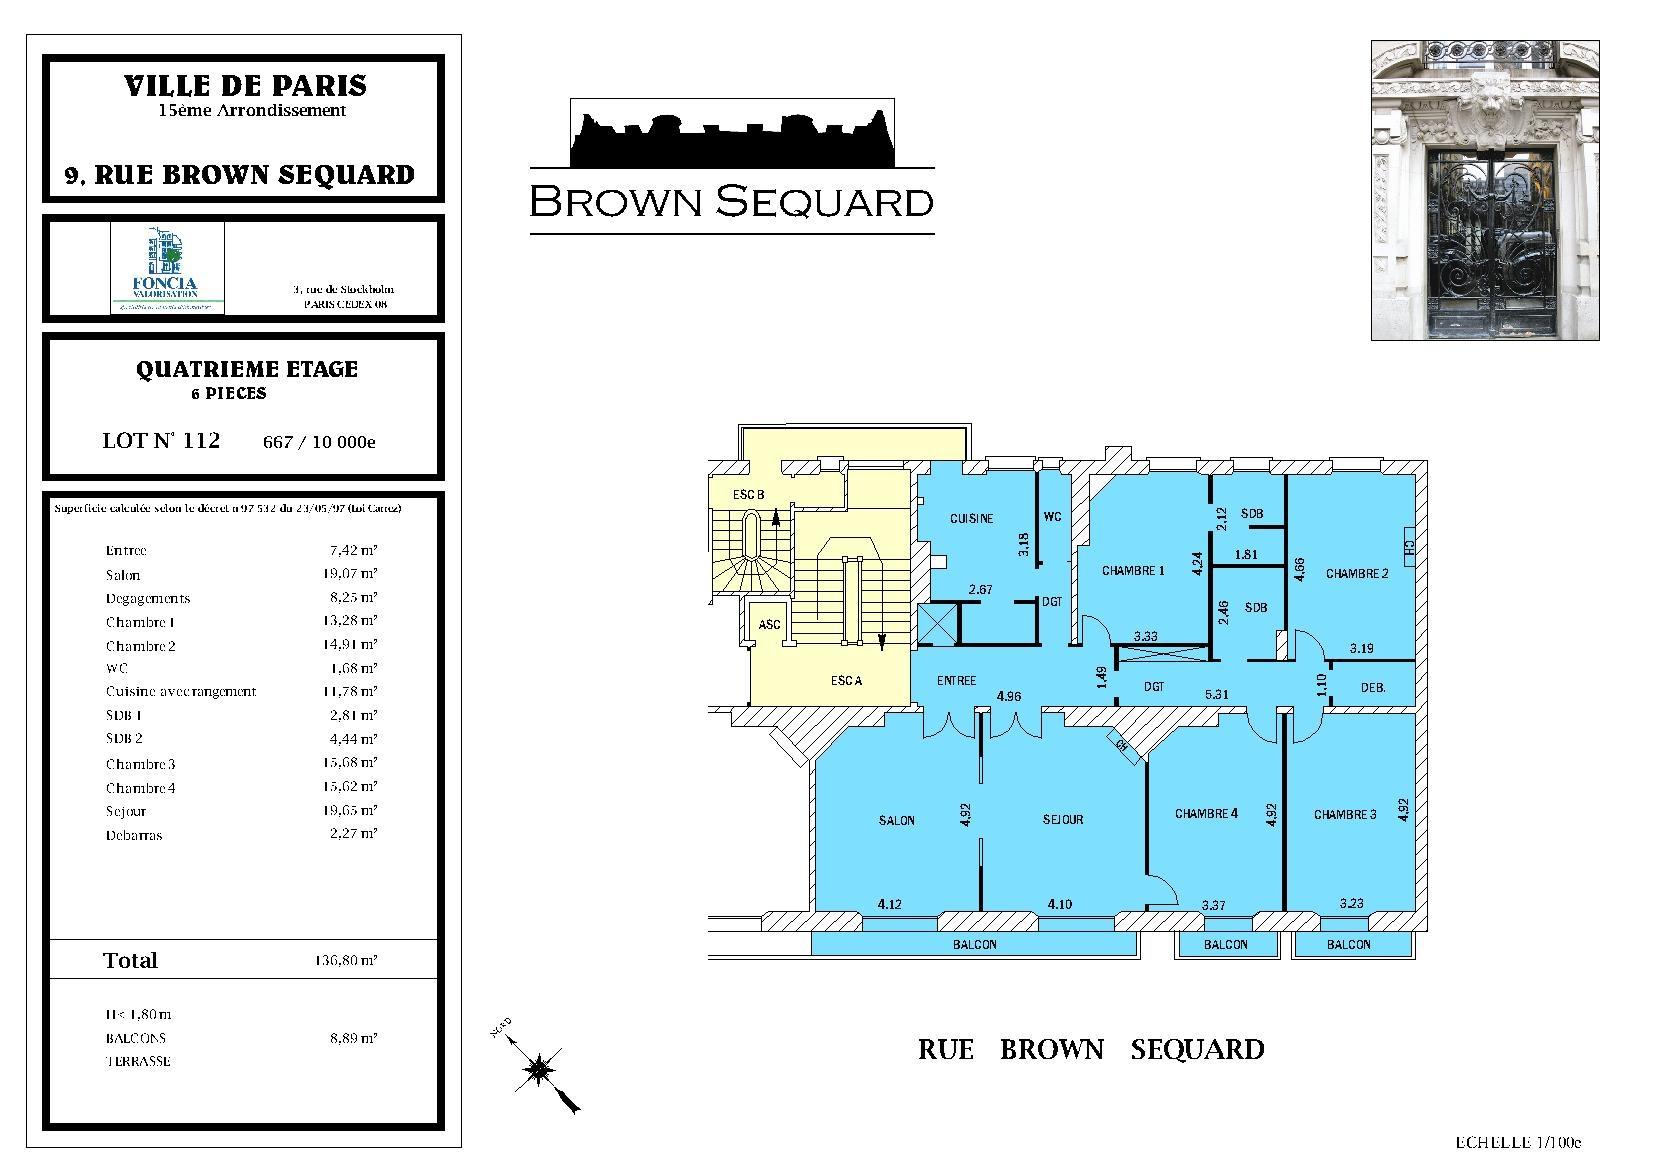 brown sequard vente la d coupe. Black Bedroom Furniture Sets. Home Design Ideas